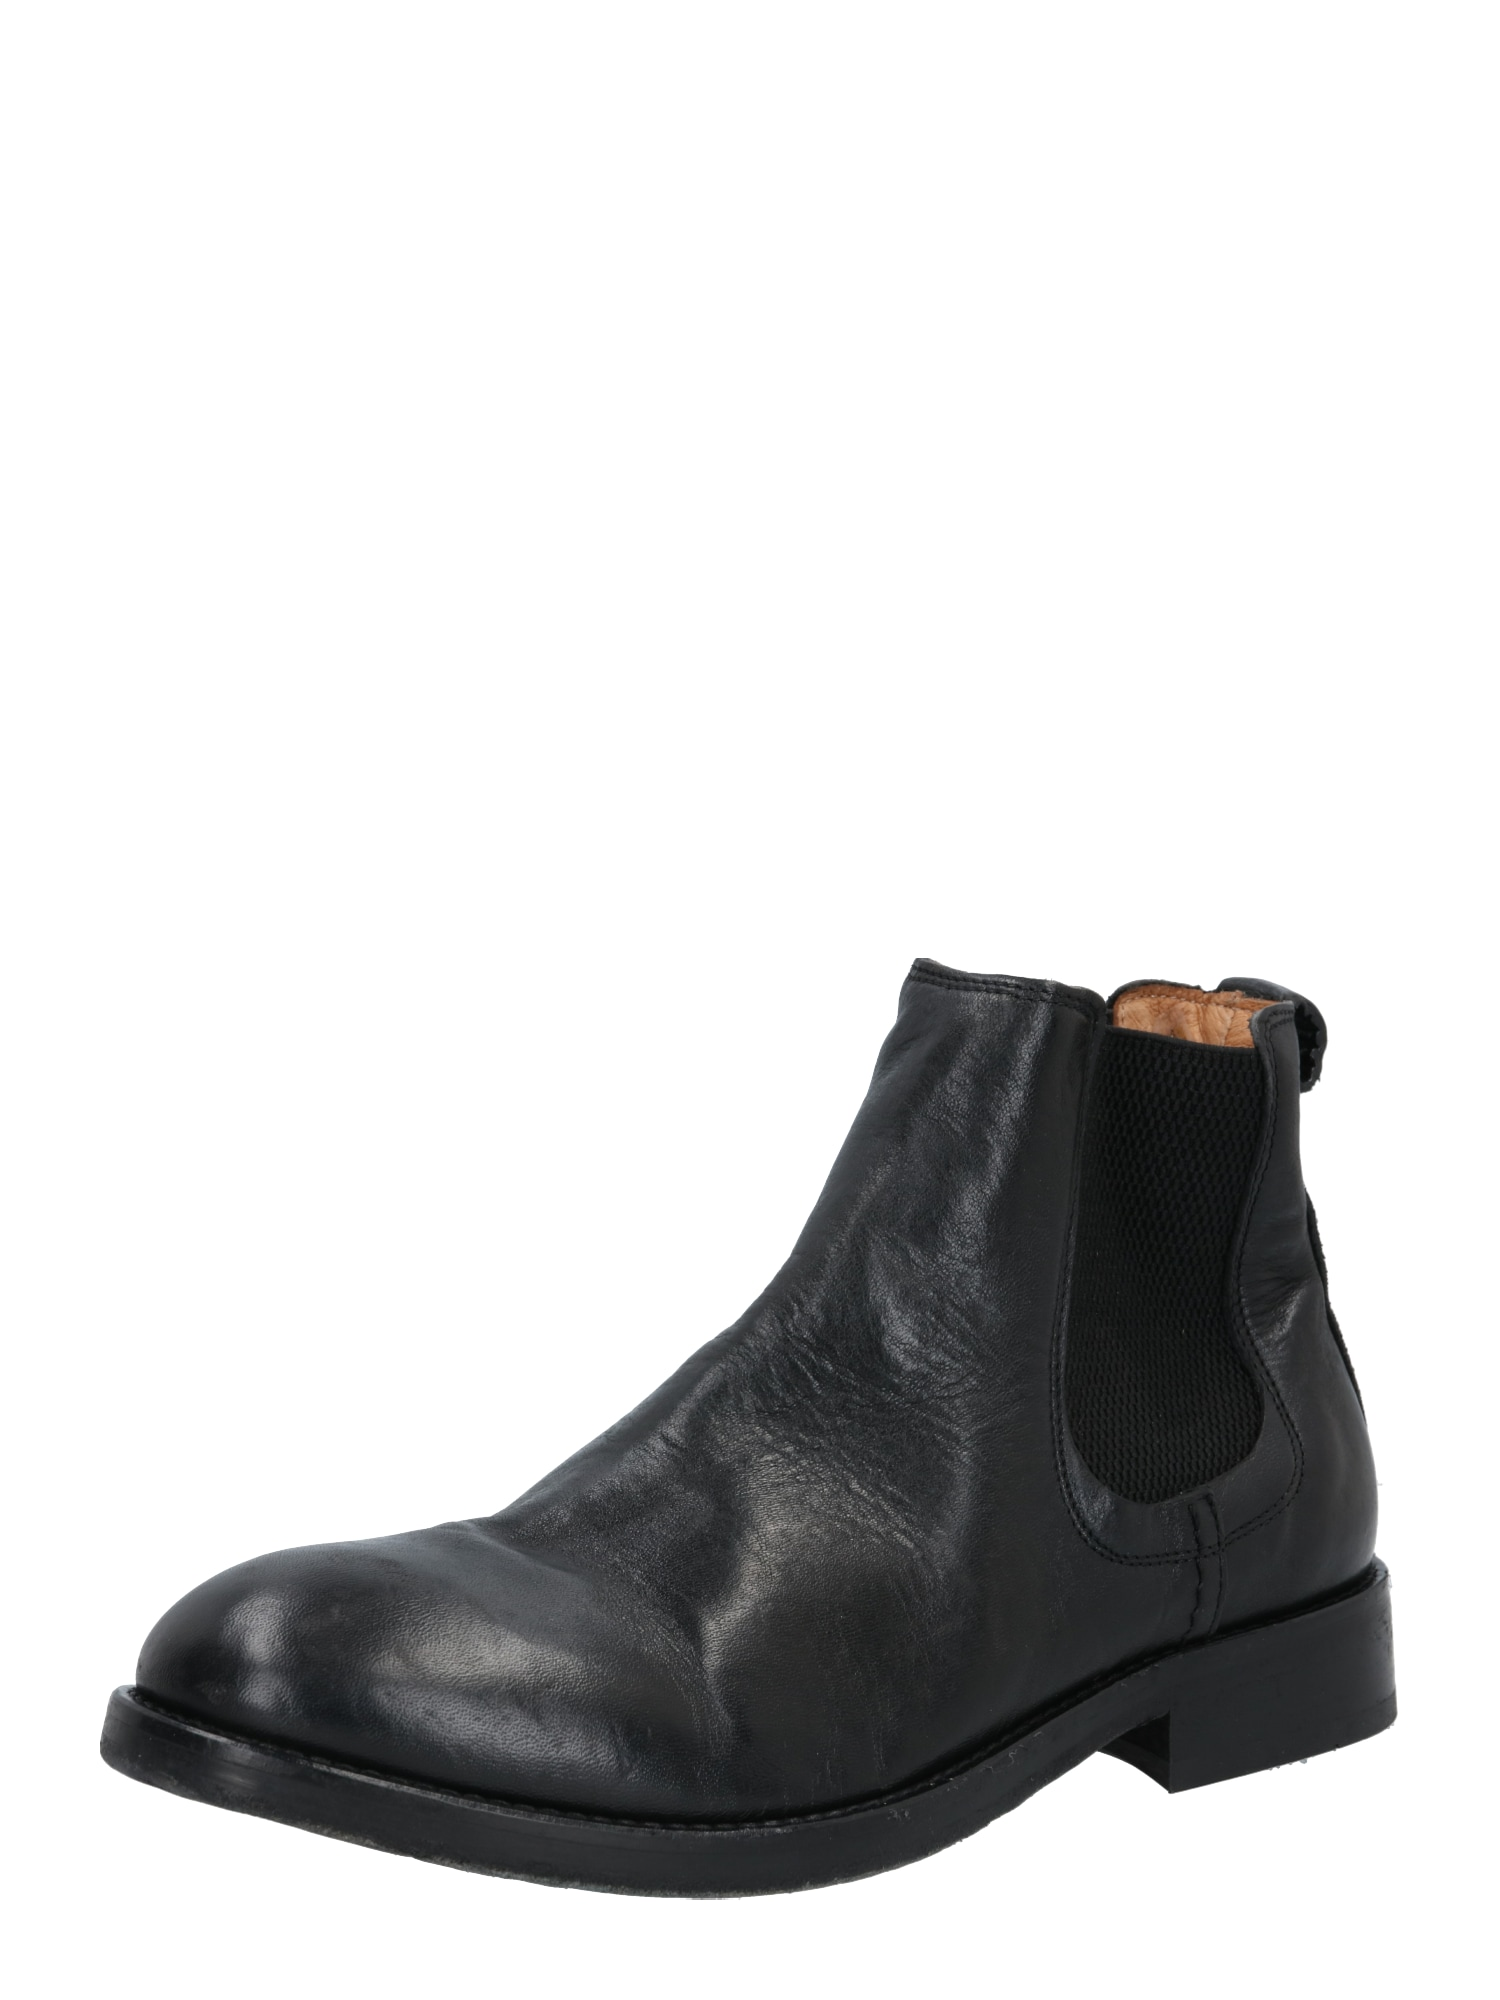 "Hudson London ""Chelsea"" batai juoda"